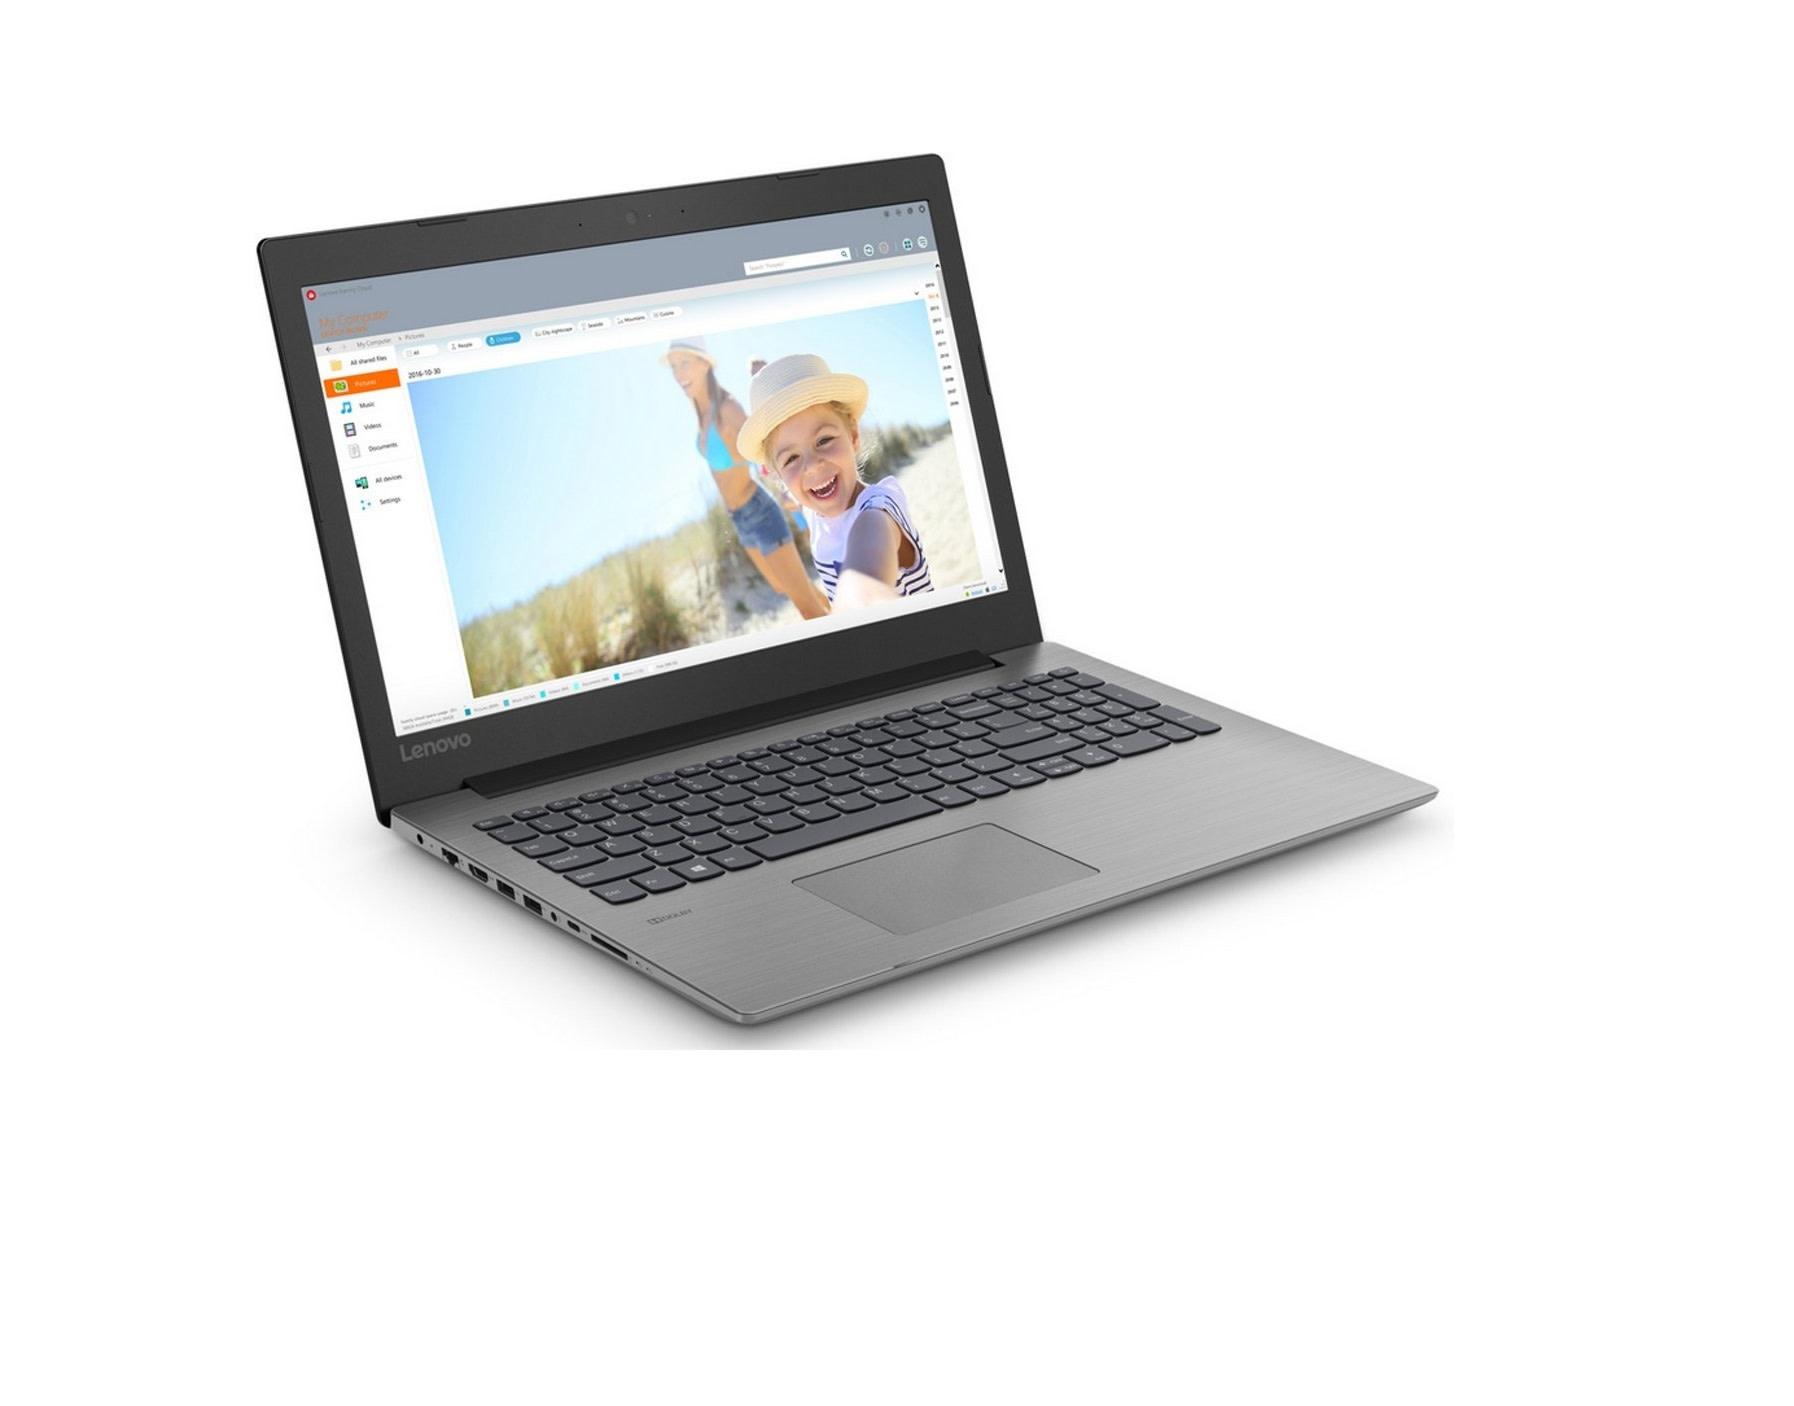 Lenovo Ideapad 330 Ryzen 7 8GB 240Gb SSD RX540 15.6'' FHD scherm Win 10 Pro laptop